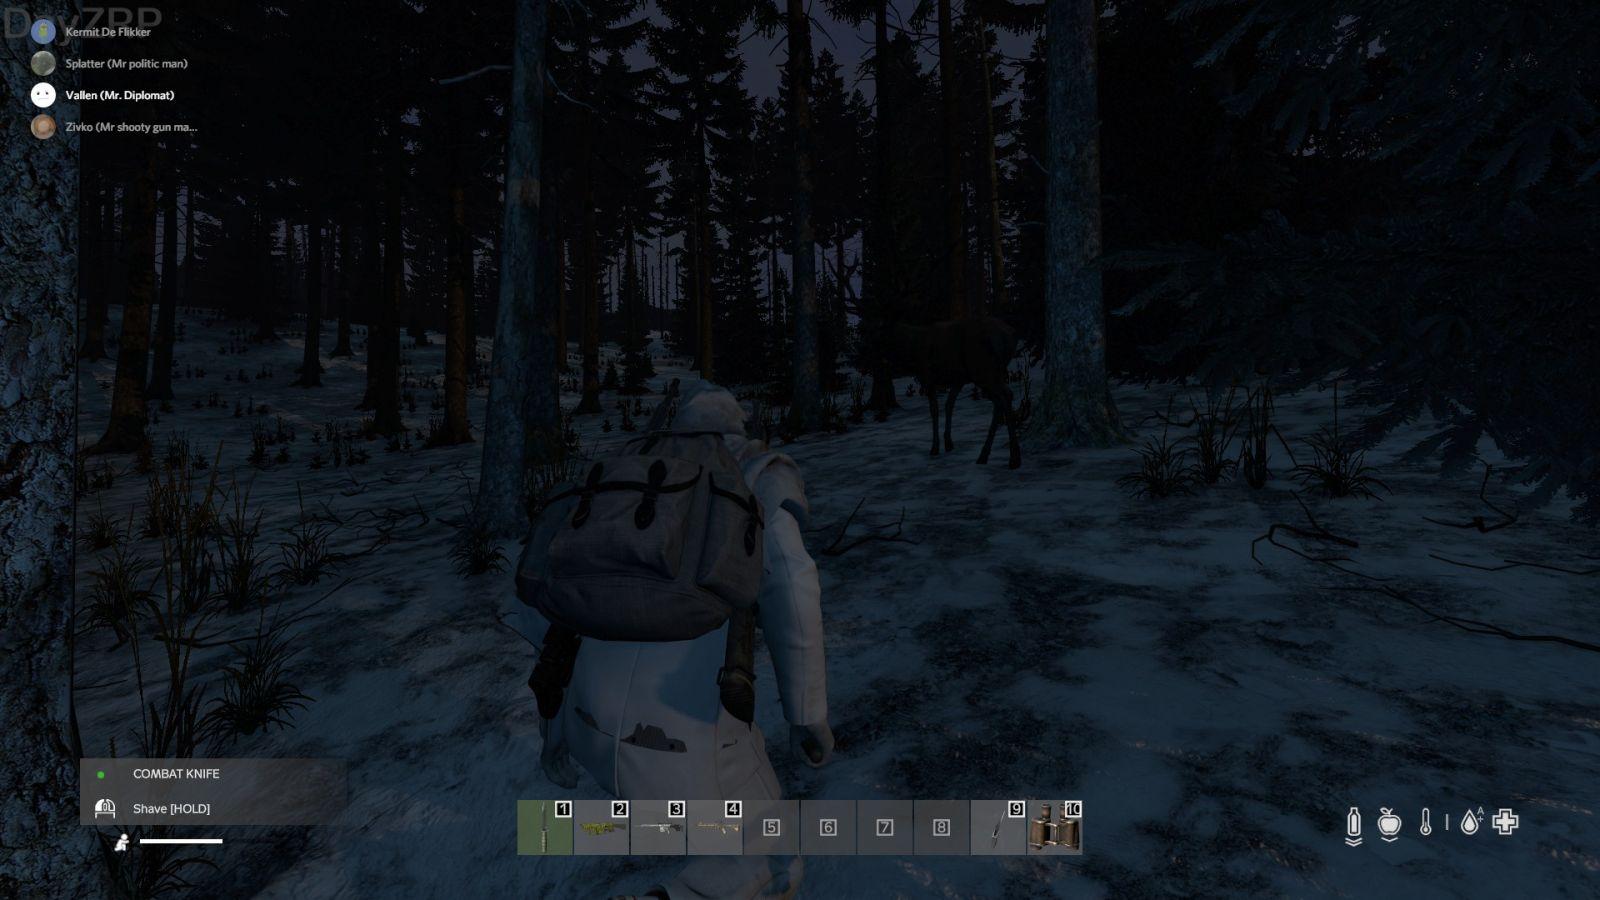 Deers seem to let you get very close.